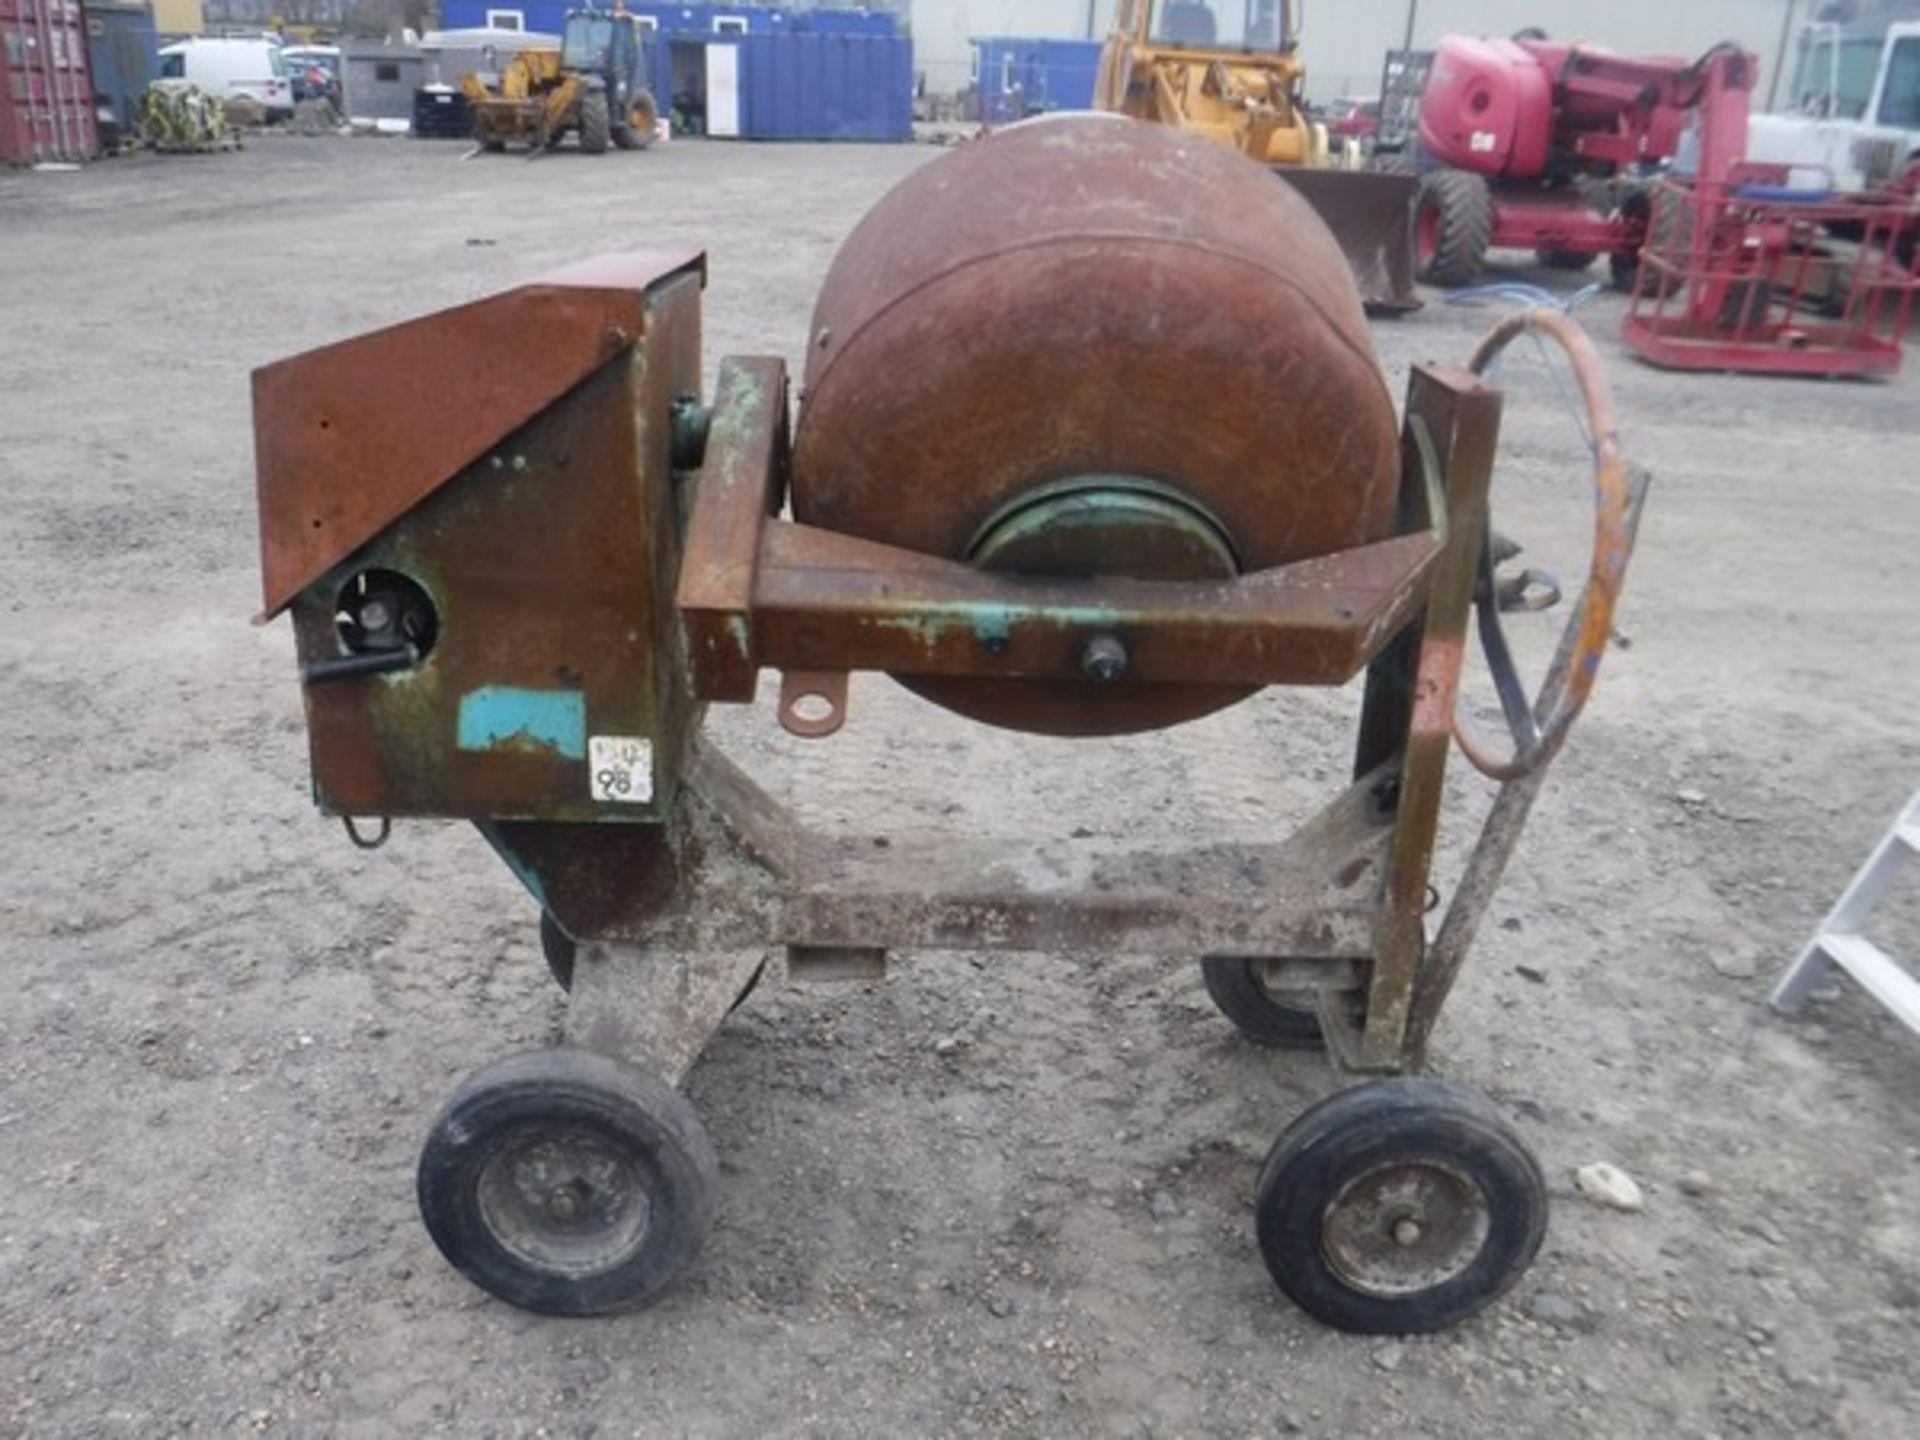 Auktionslos 280 - BARROW diesel cement mixer c/w handle